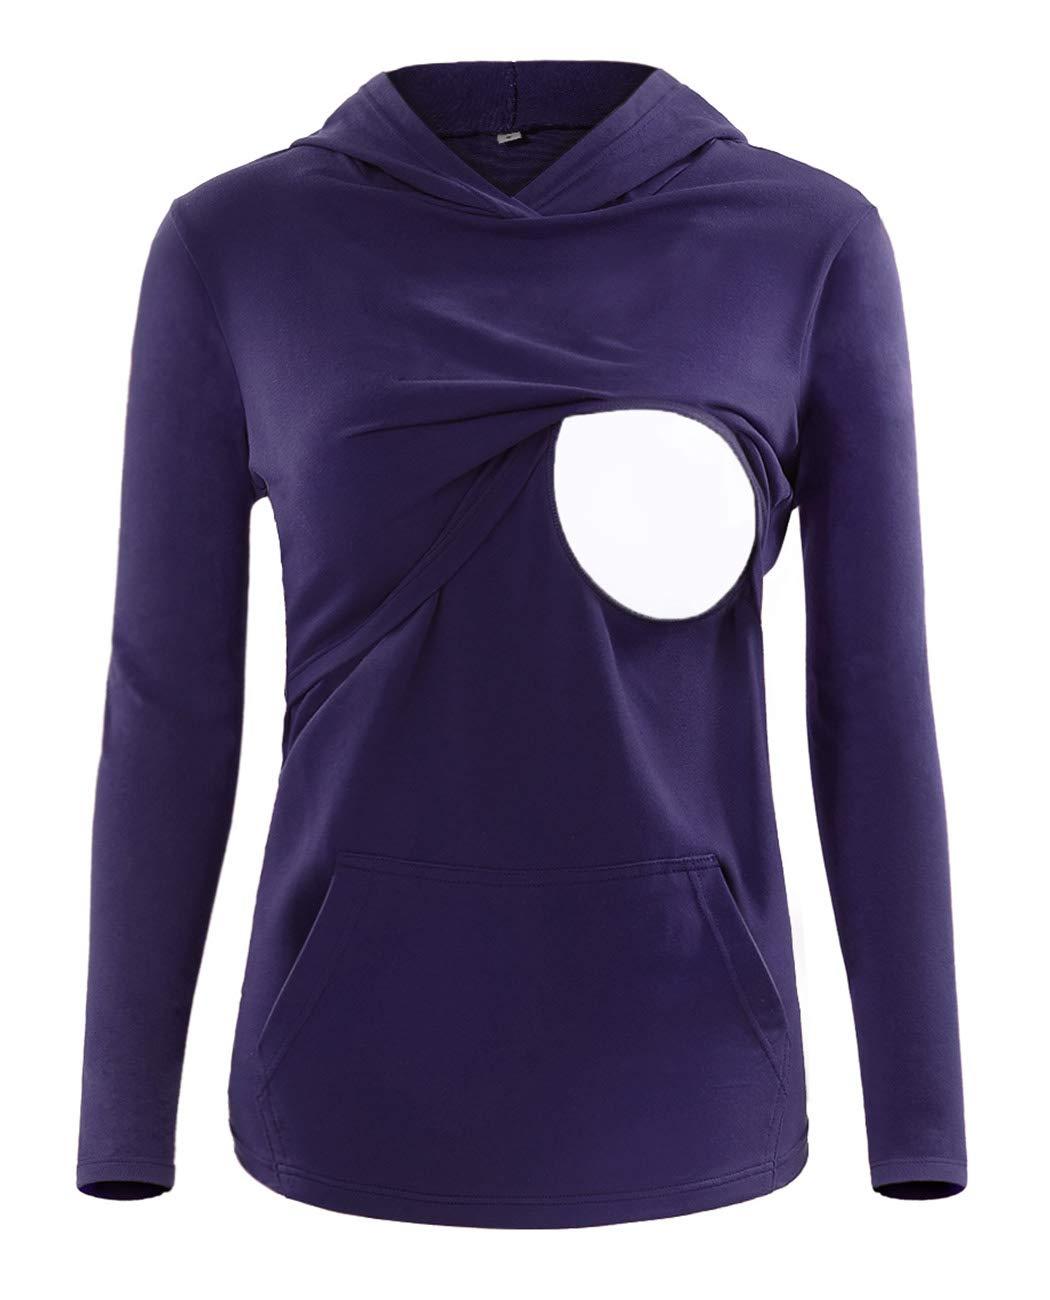 SUNNYBUY Women's Long Sleeve Nursing Tops Breastfeeding Hoodie Clothes Maternity Shirt Kangaroo Pocket